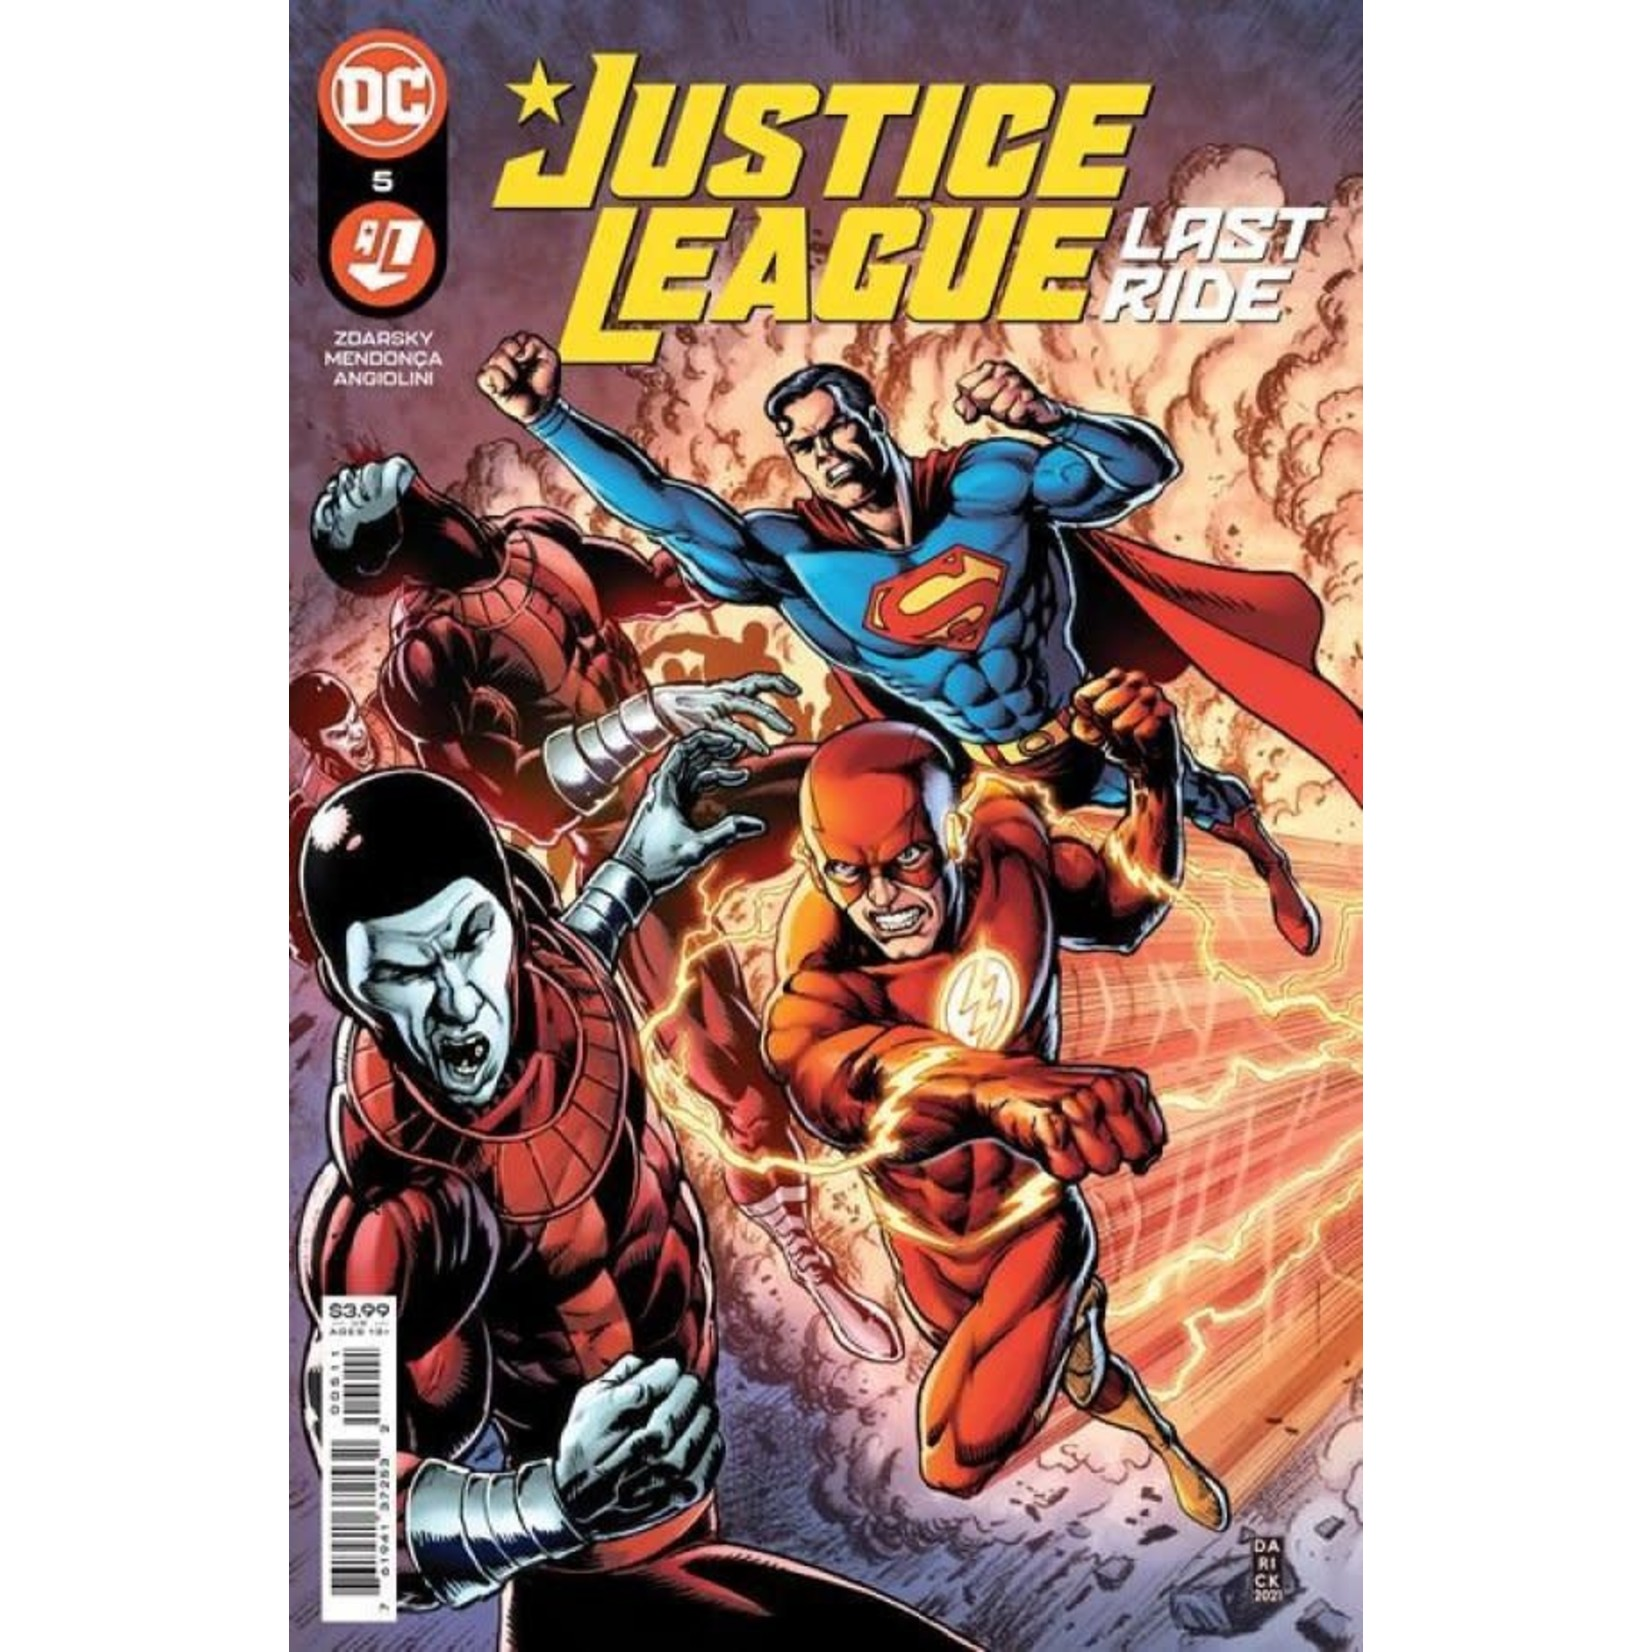 DC Comics Justice League: Last Ride #5